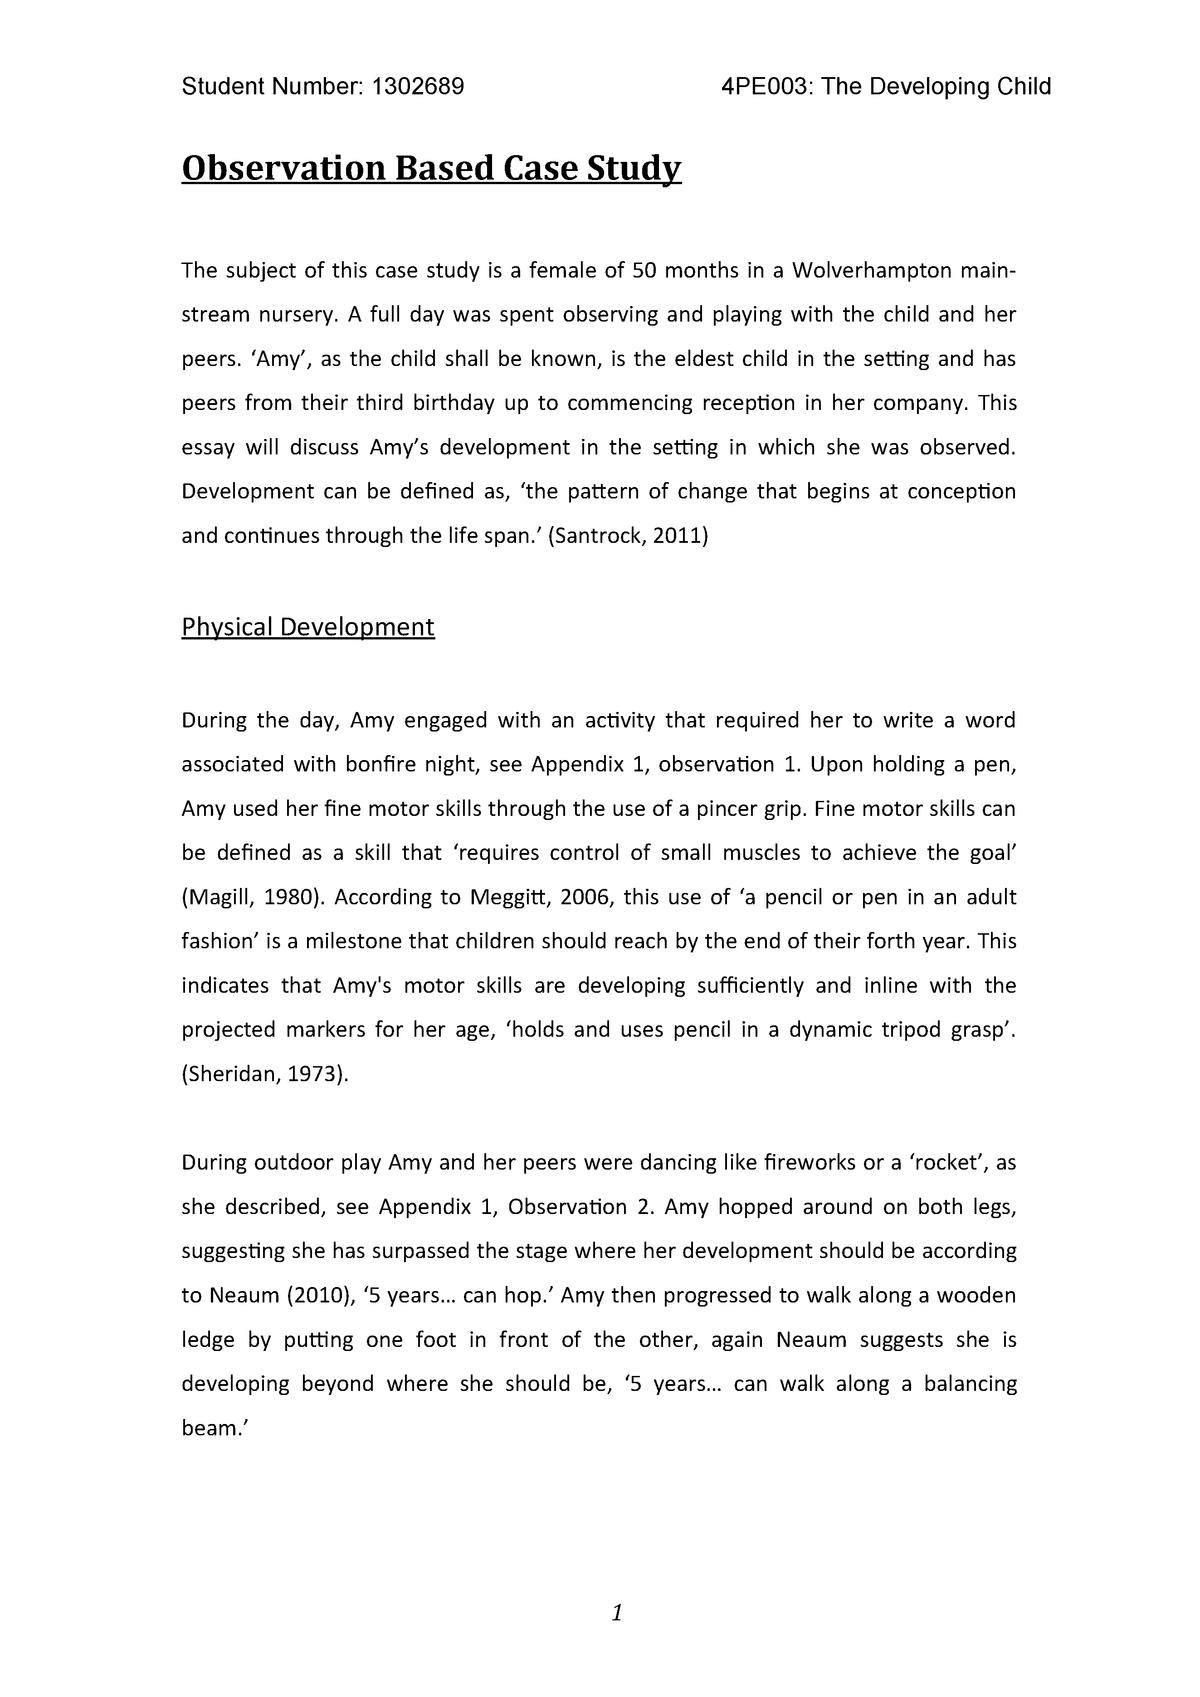 Observation Based Case Study - 4PE003: The Developing Child - StuDocu